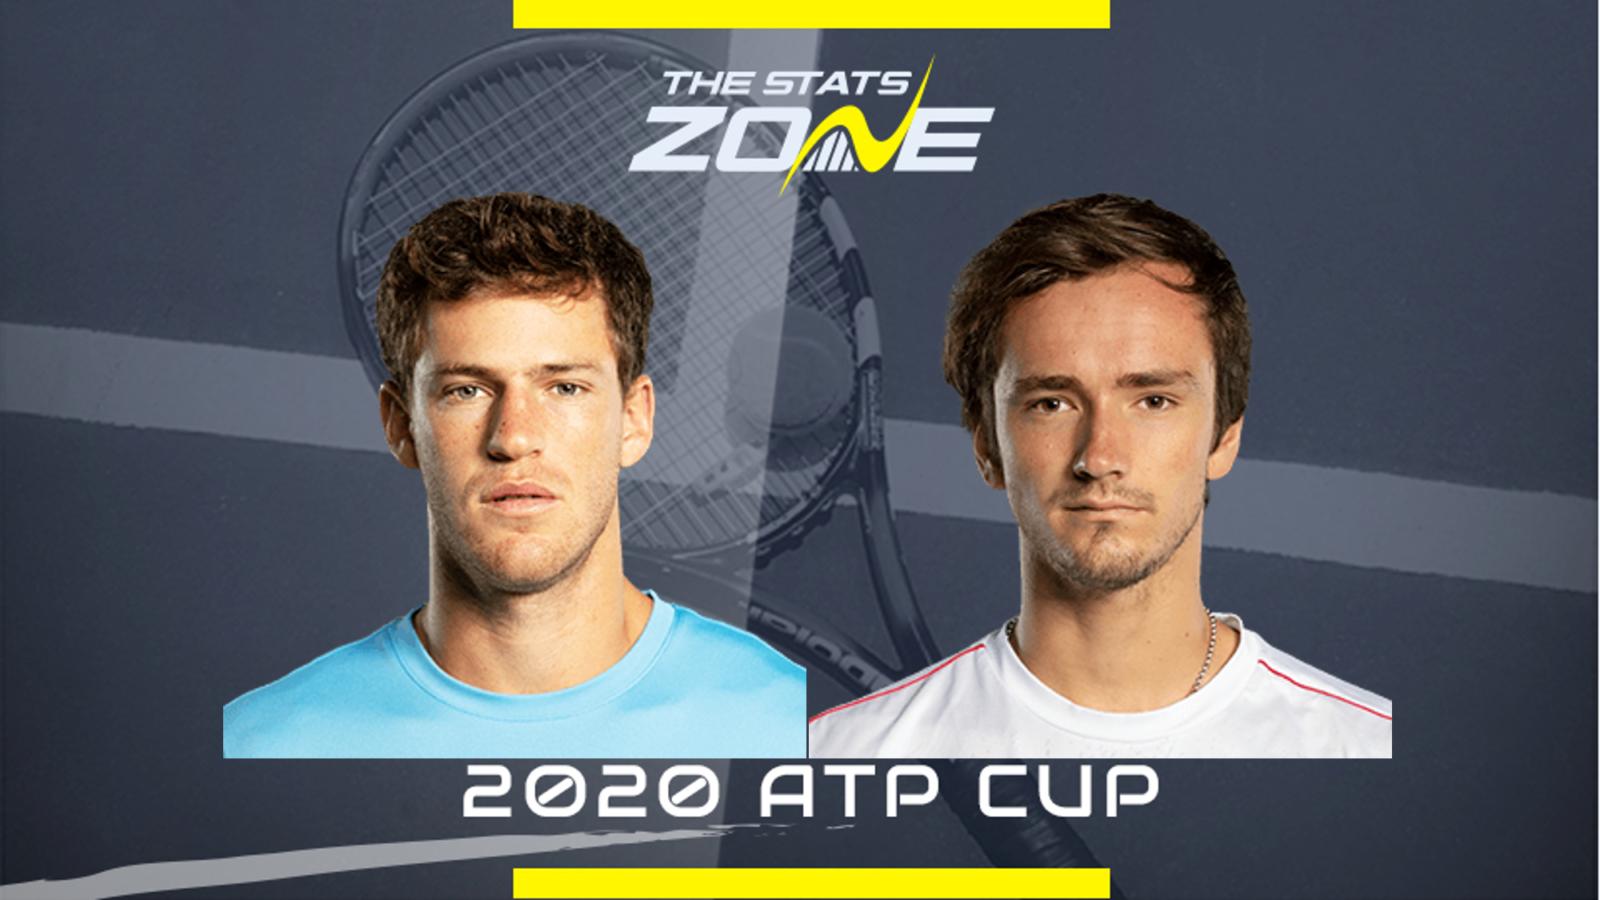 Atp Cup 2020 Diego Schwartzman Vs Daniil Medvedev Preview Prediction The Stats Zone